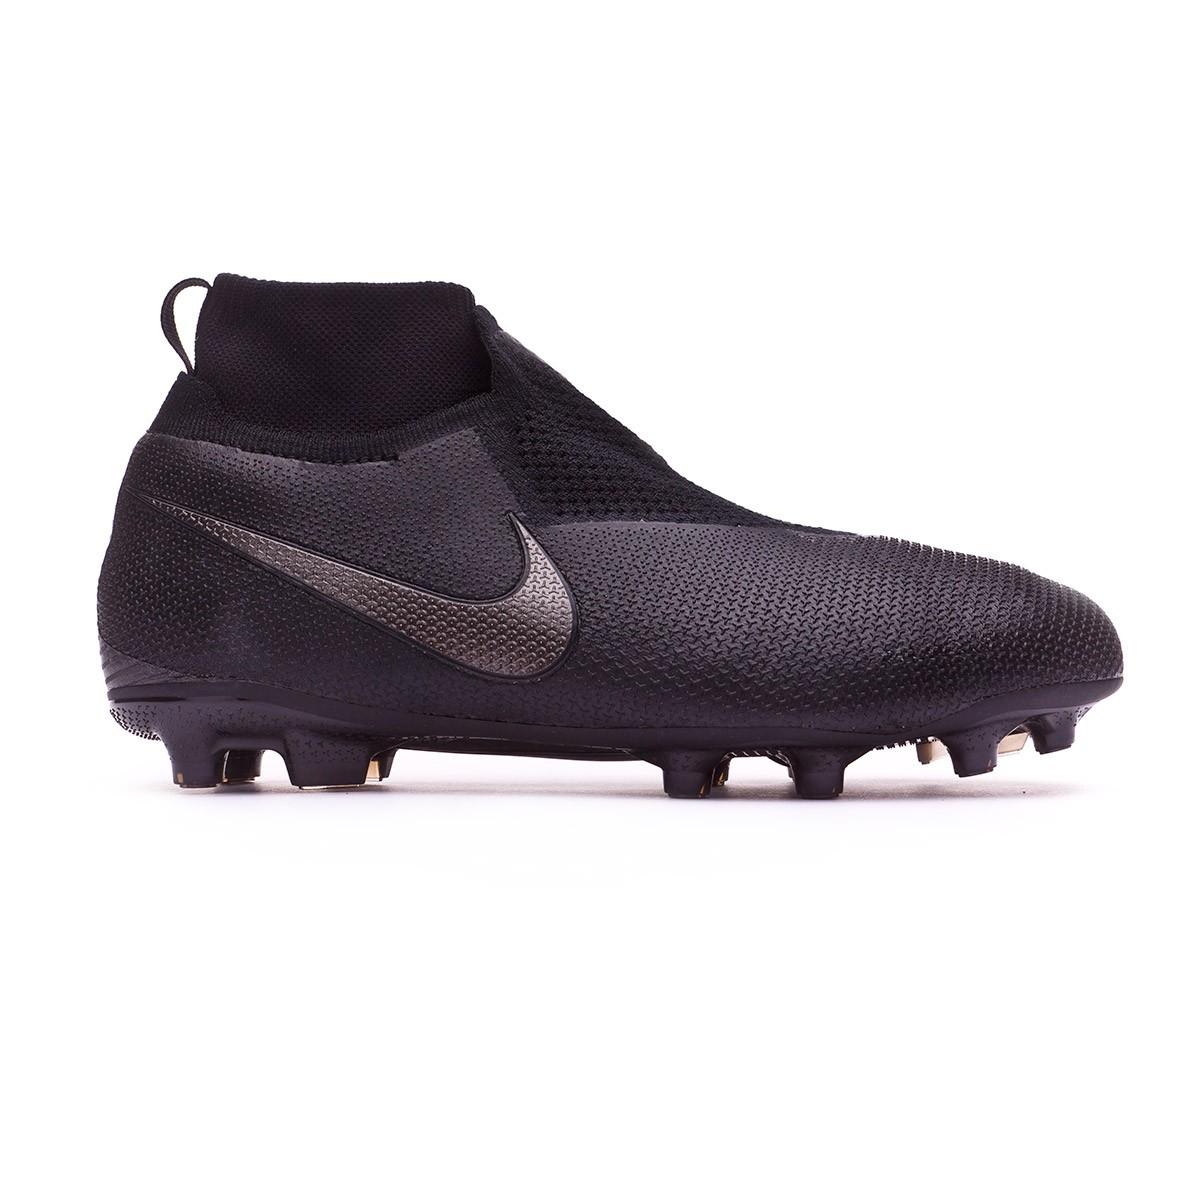 f702f84d1 Football Boots Nike Kids Phantom Vision Elite DF MG Black - Tienda de  fútbol Fútbol Emotion